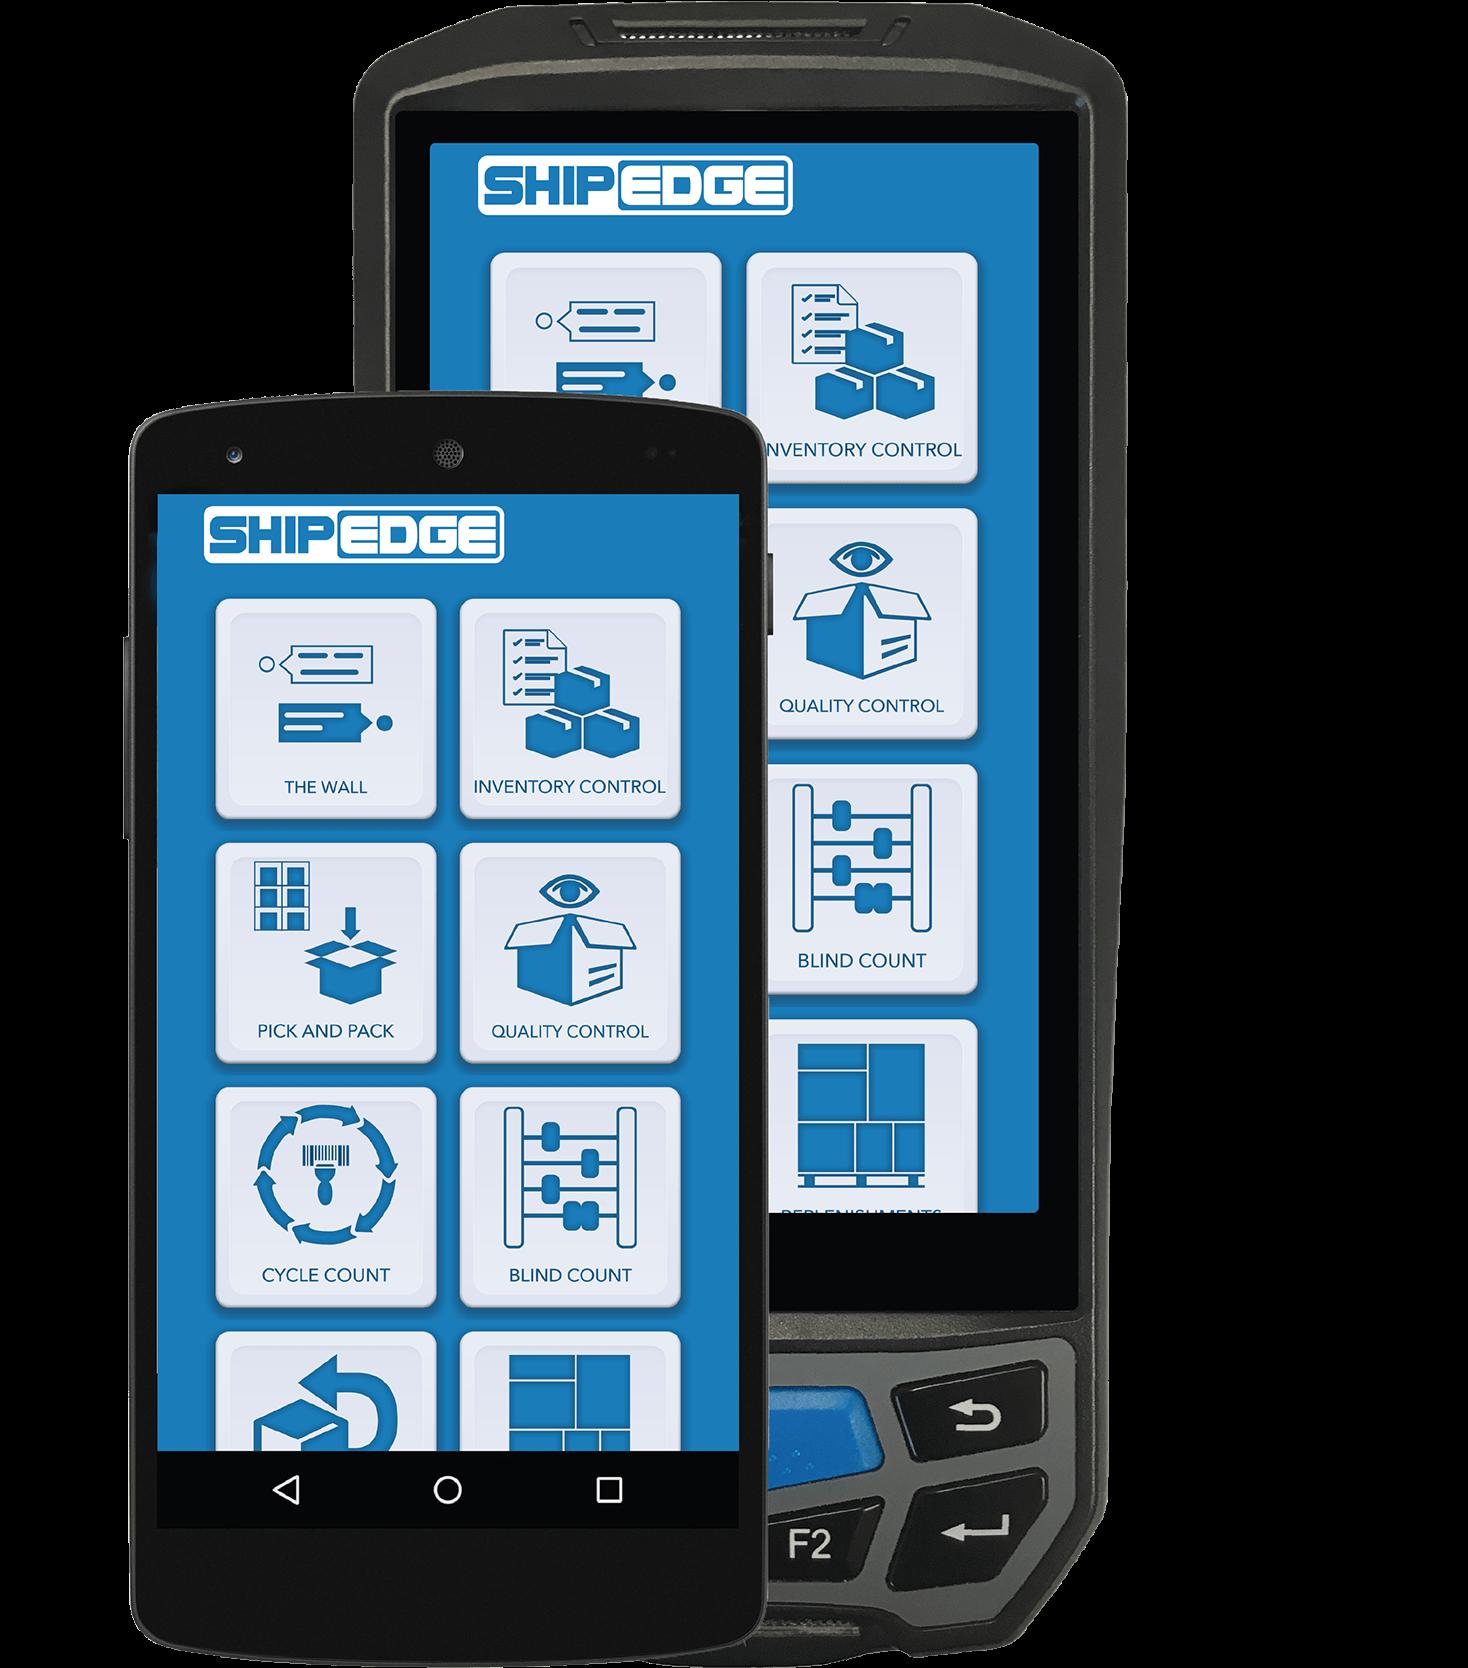 Shipedge Mobile Barcode Scanner